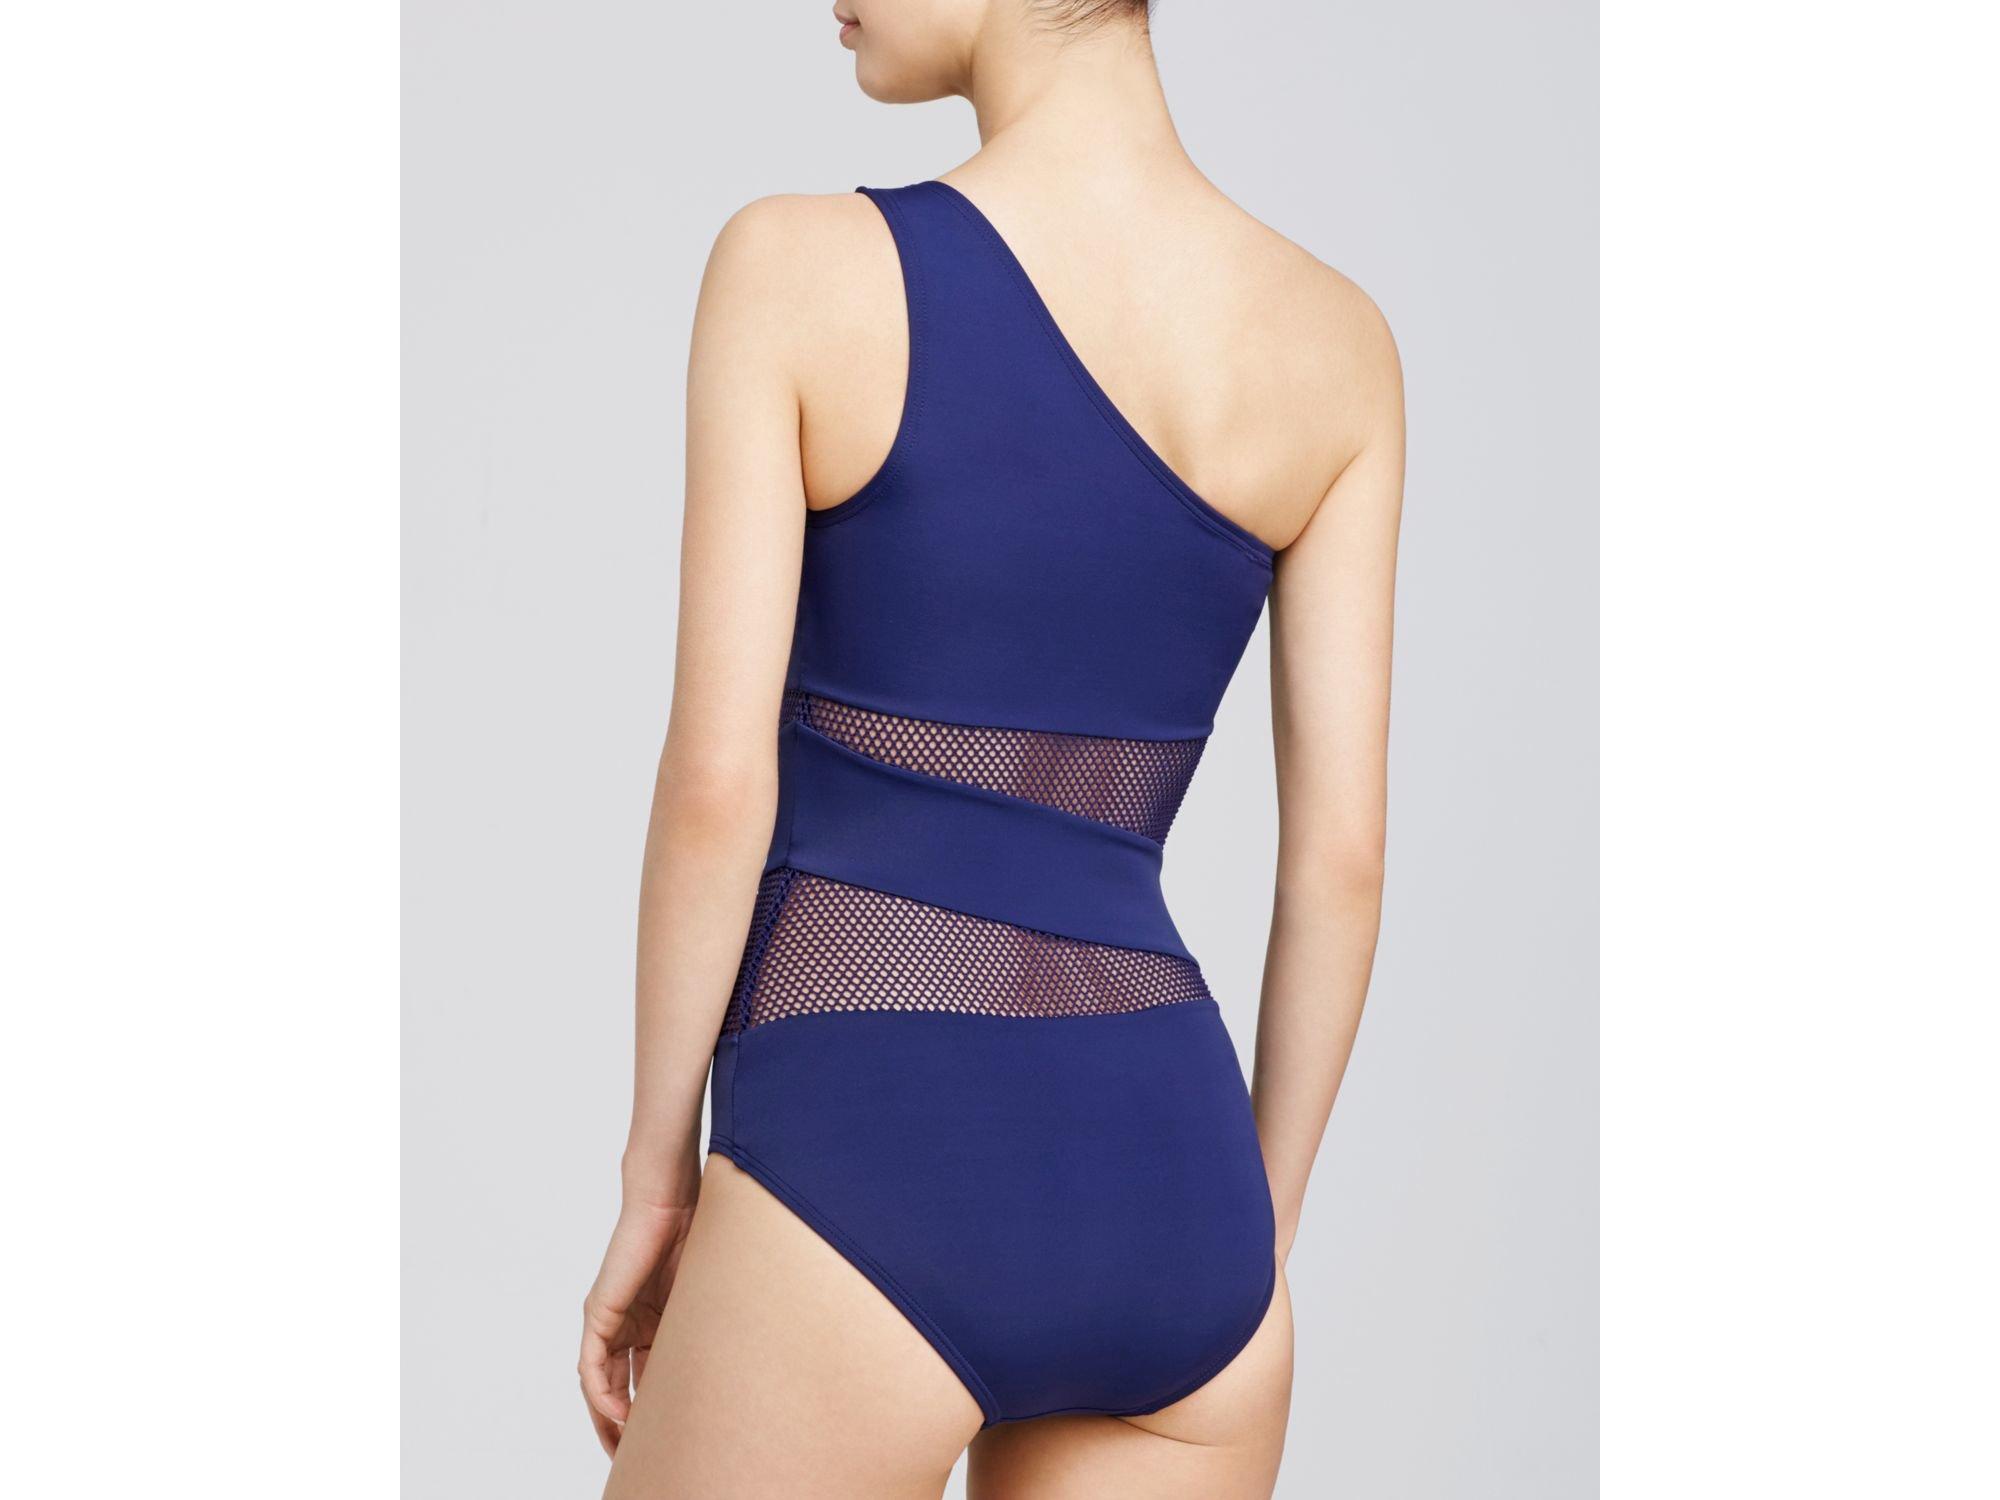 fee00a23e9ea5 DKNY Mesh Effect One Shoulder One Piece Swimsuit in Purple - Lyst